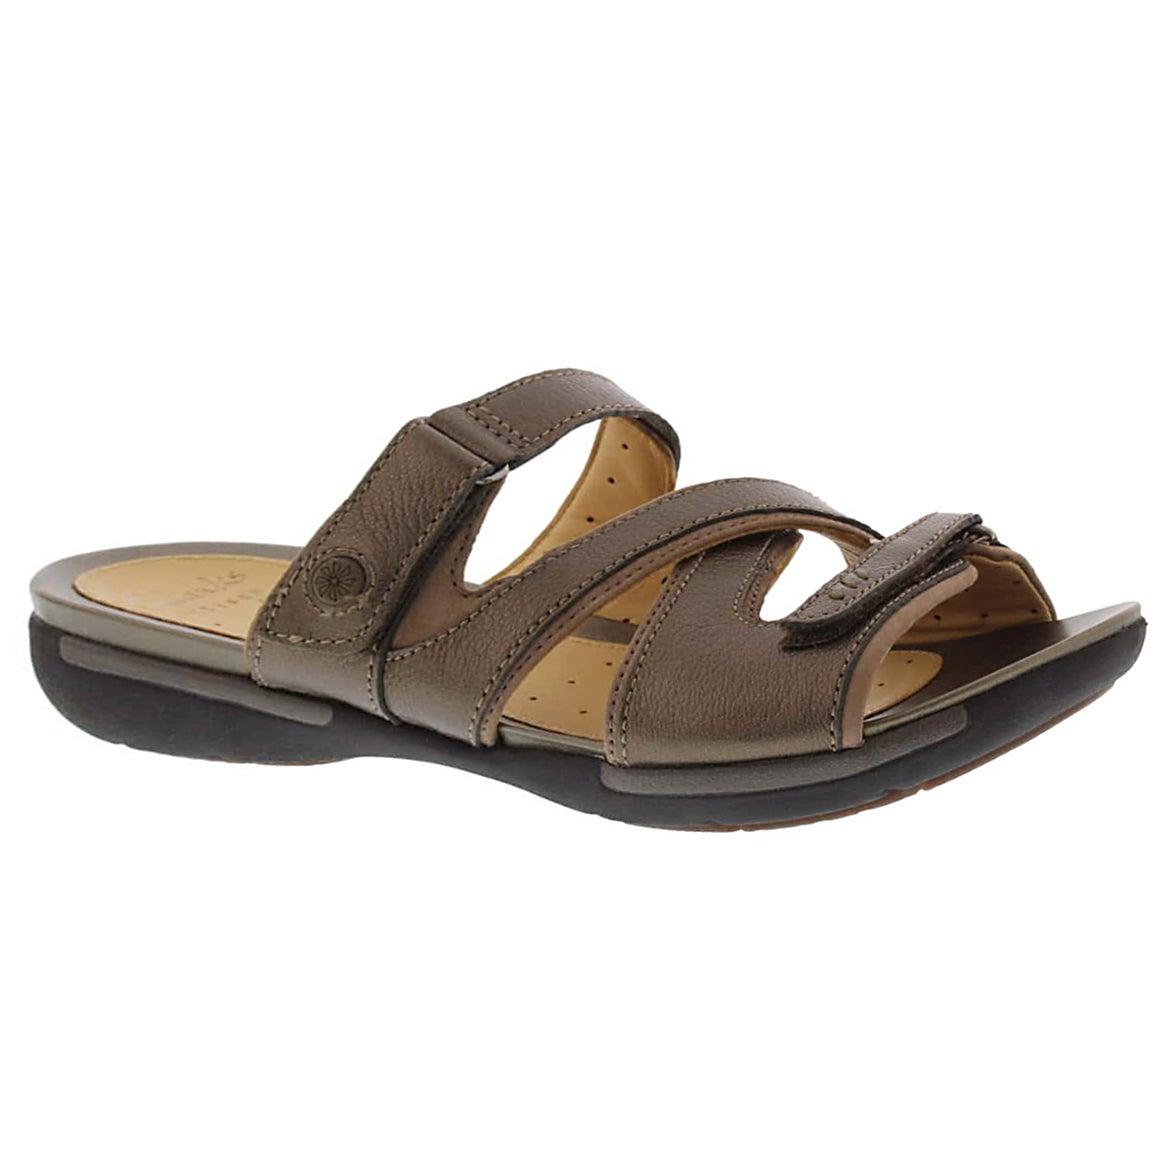 Lds Un.Verlee bronze casual slide sandal